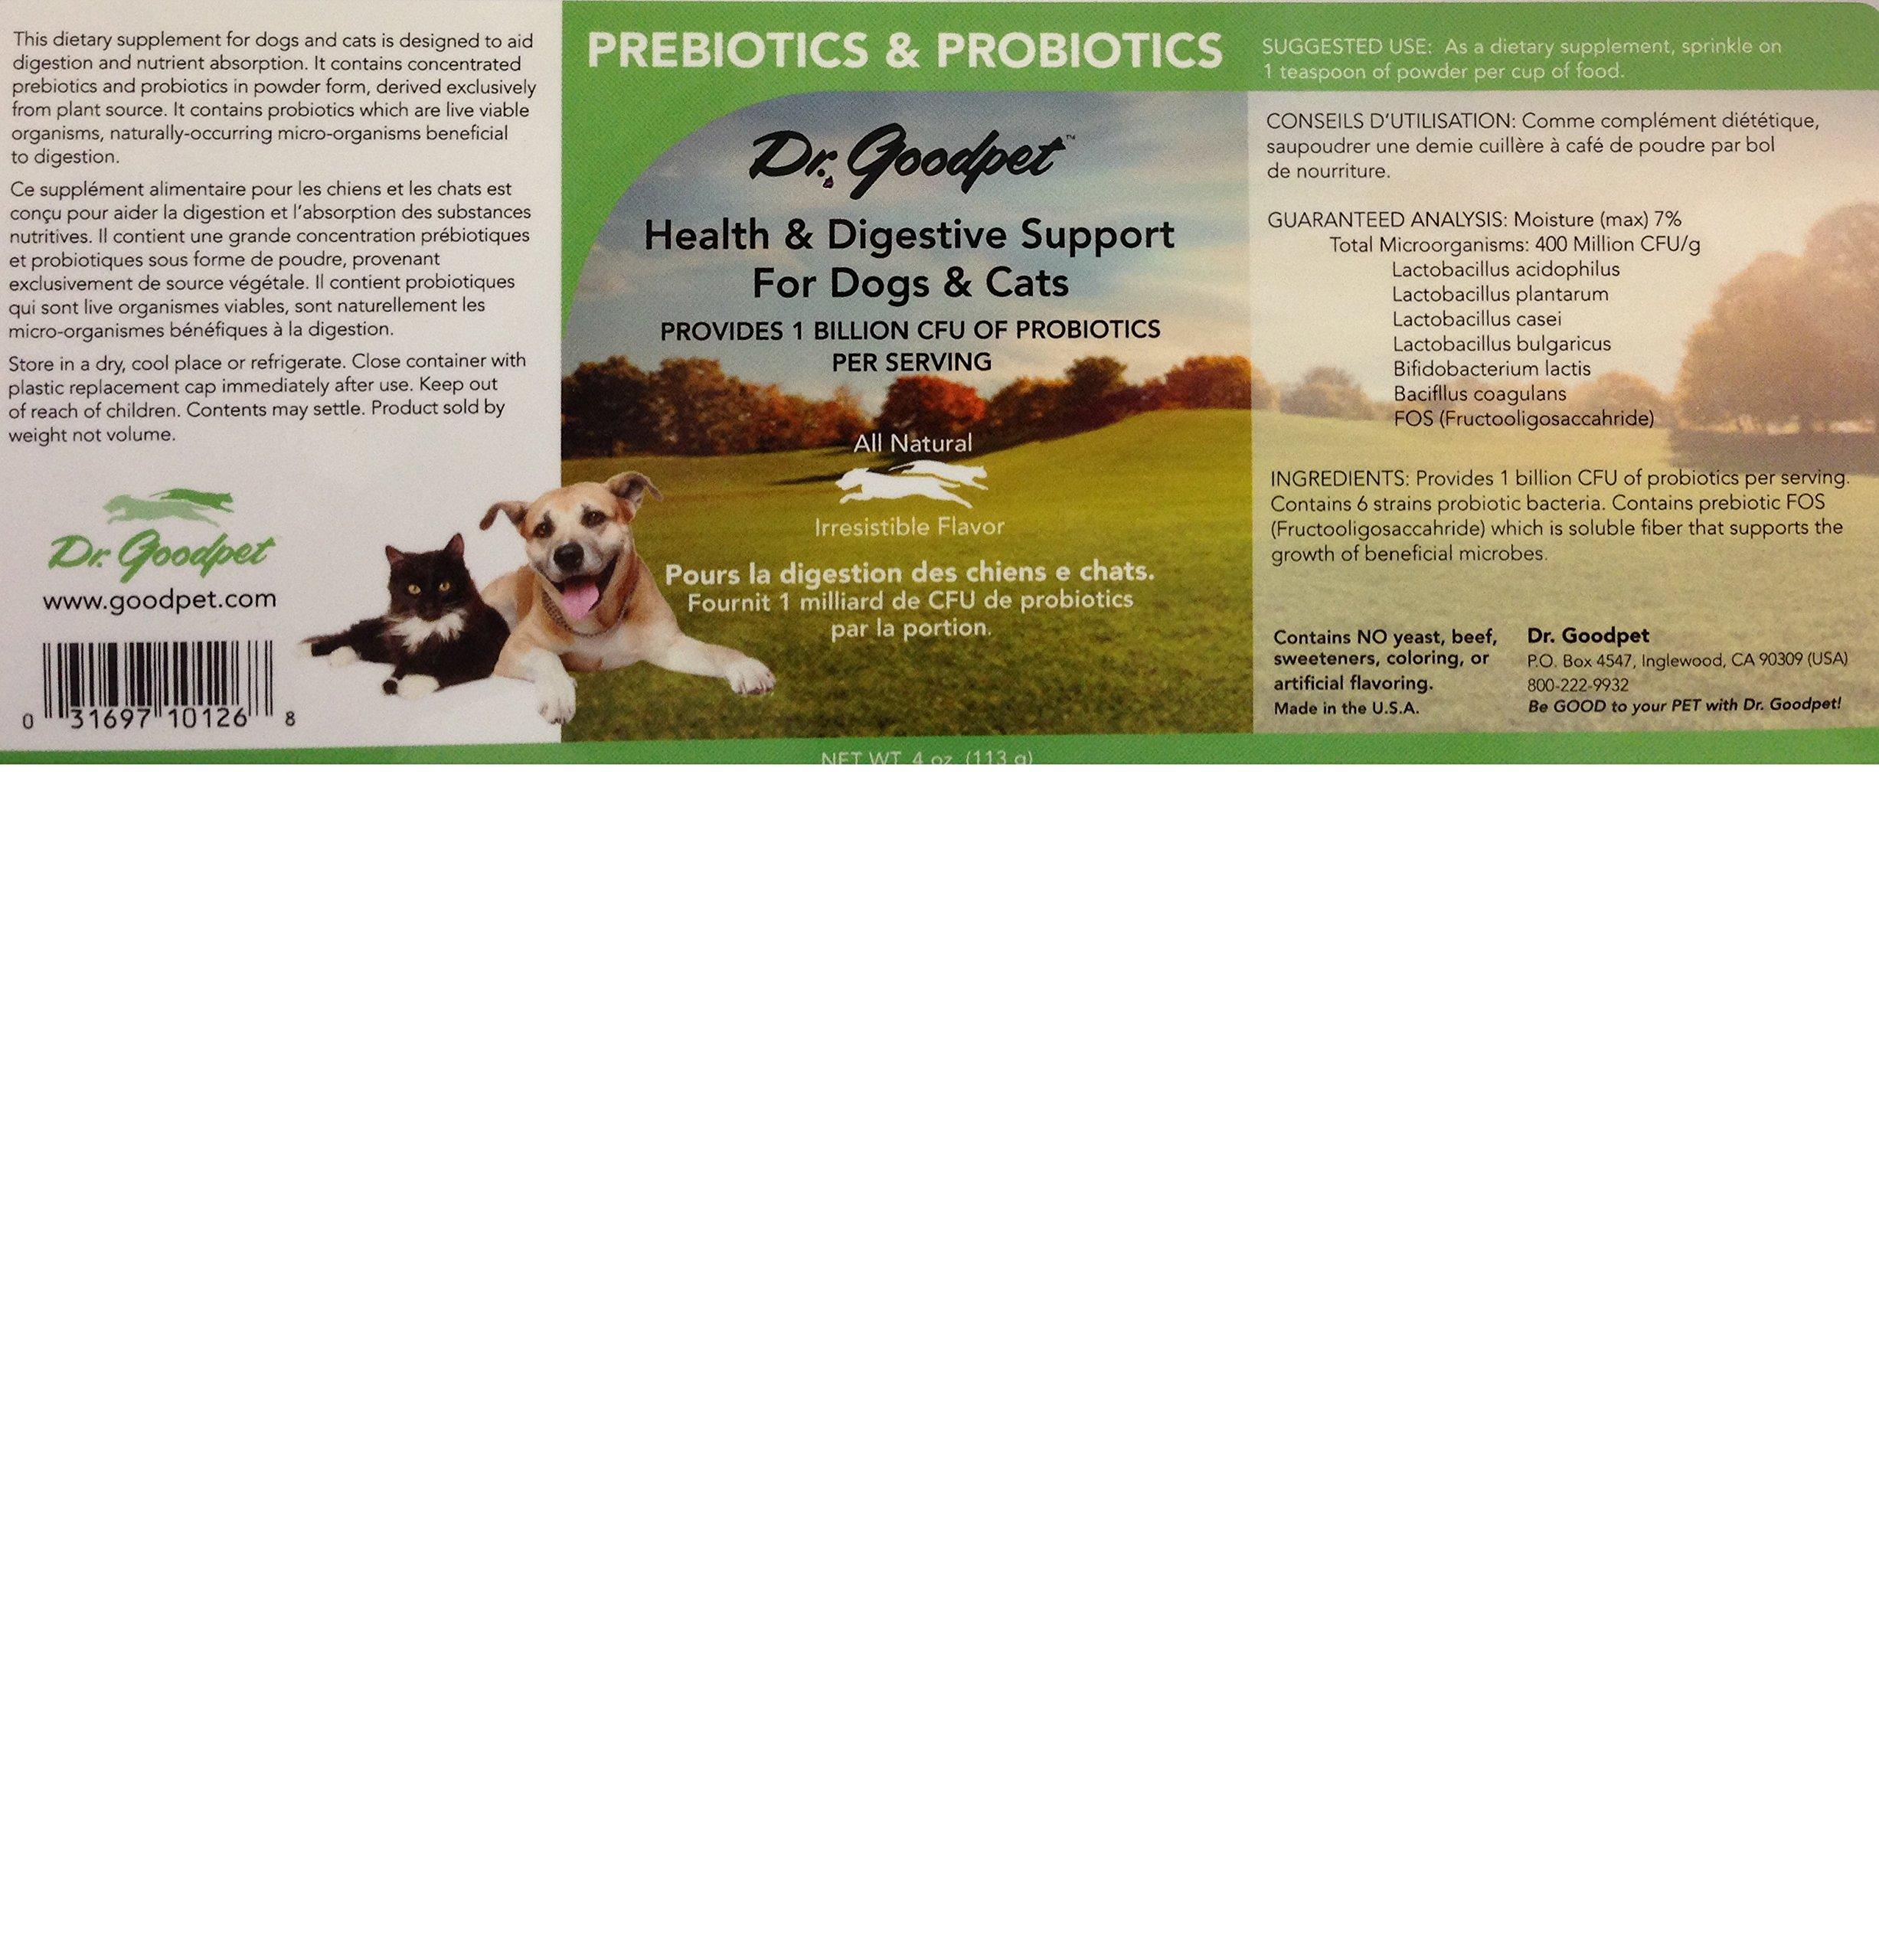 Dr. Goodpet Probiotics w/prebiotics - Billions of High-Potency CFU's - Superior Digestive Support by Dr. Goodpet